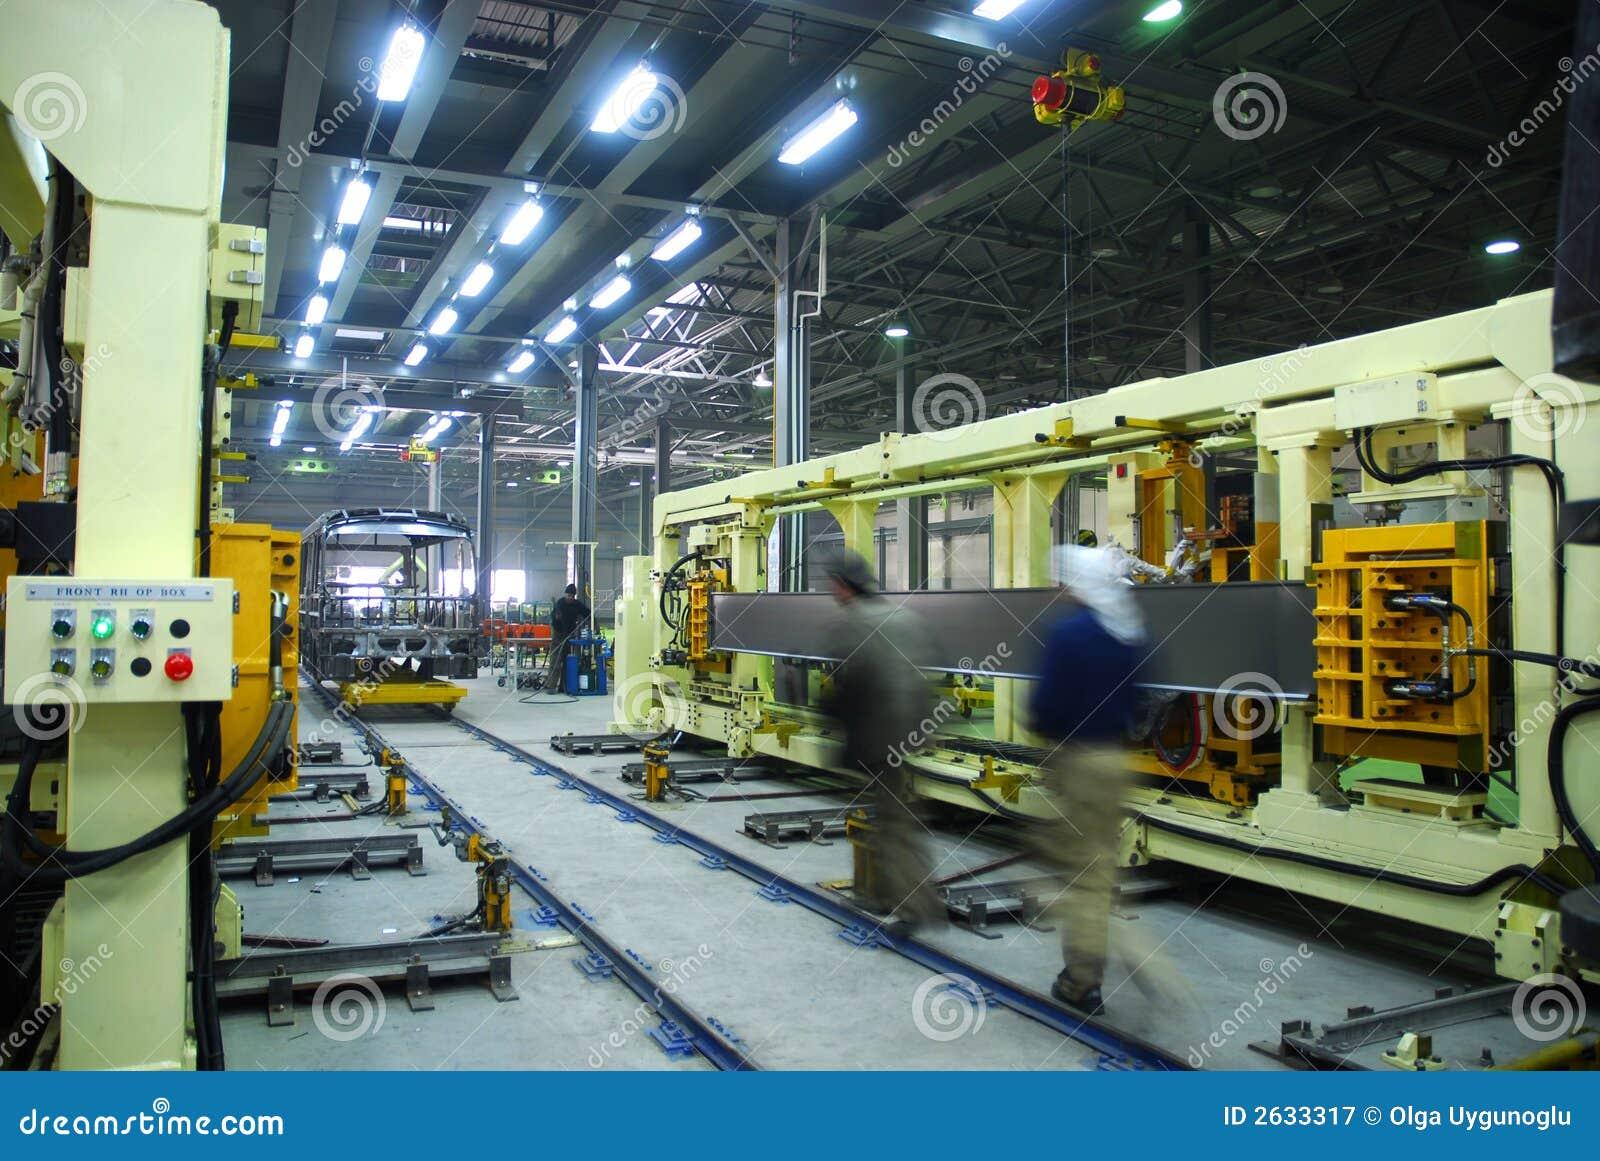 8 fabryki